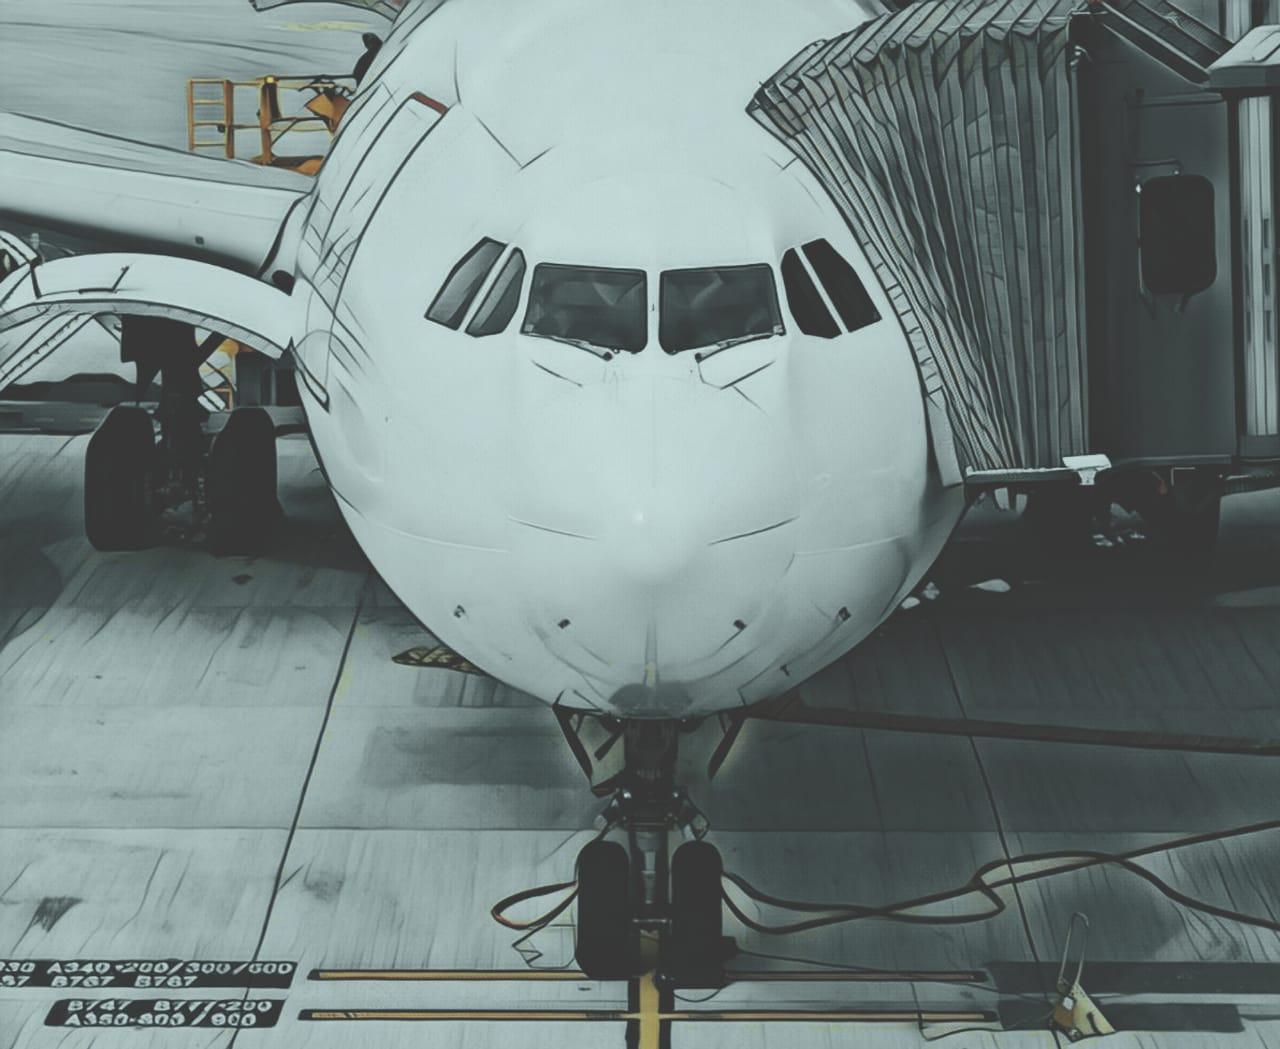 https: img-k.okeinfo.net content 2019 06 20 320 2068842 tiket-pesawat-turun-pekan-depan-bagaimana-dukungan-pengelola-bandara-SDKMgaCMsM.jpg